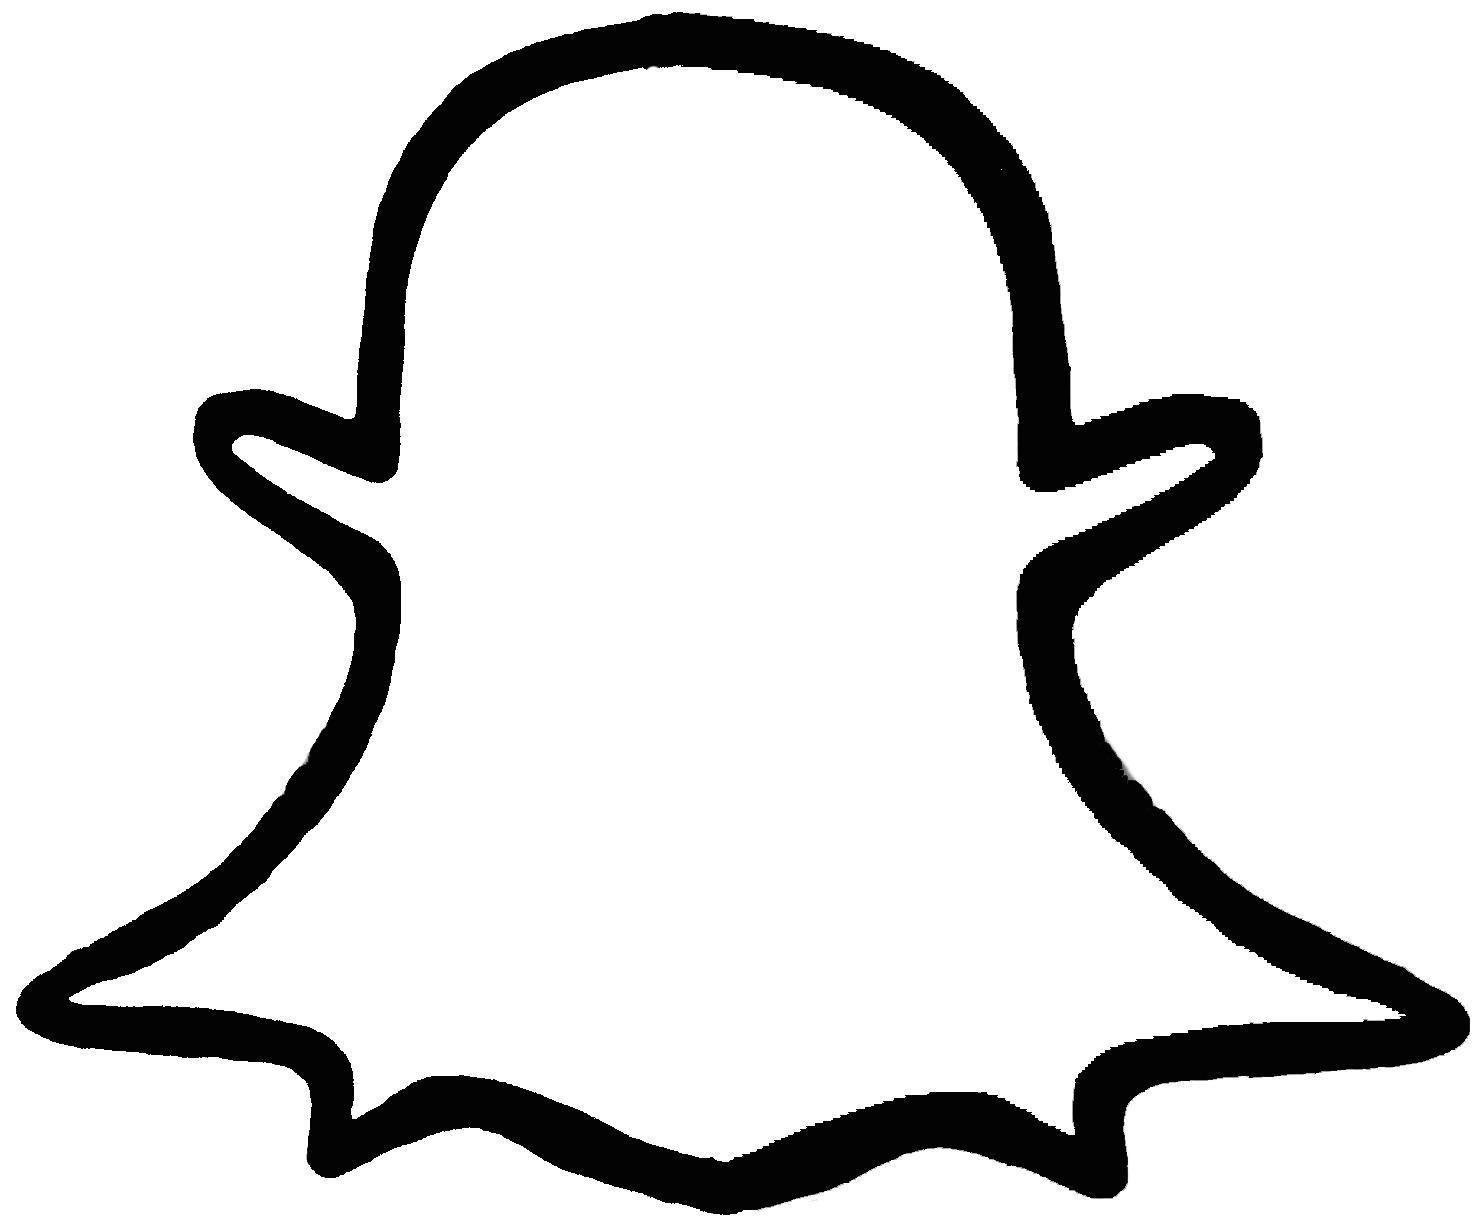 Snapchat Logo Drawing   Free download best Snapchat Logo